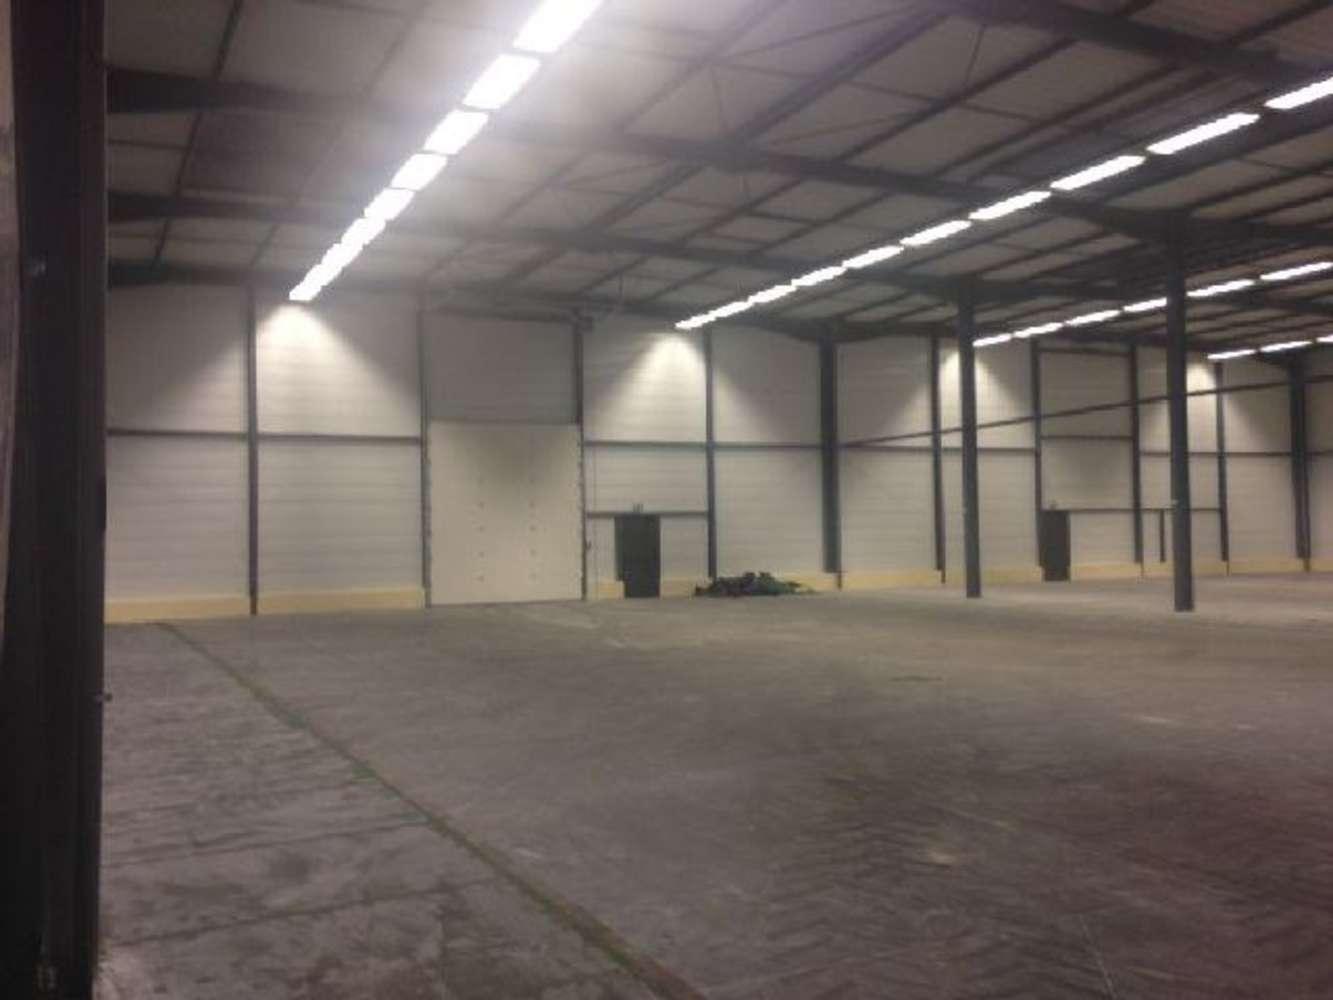 Activités/entrepôt Arnas, 69400 - Location locaux d'activité - Arnas (69) - 9453909